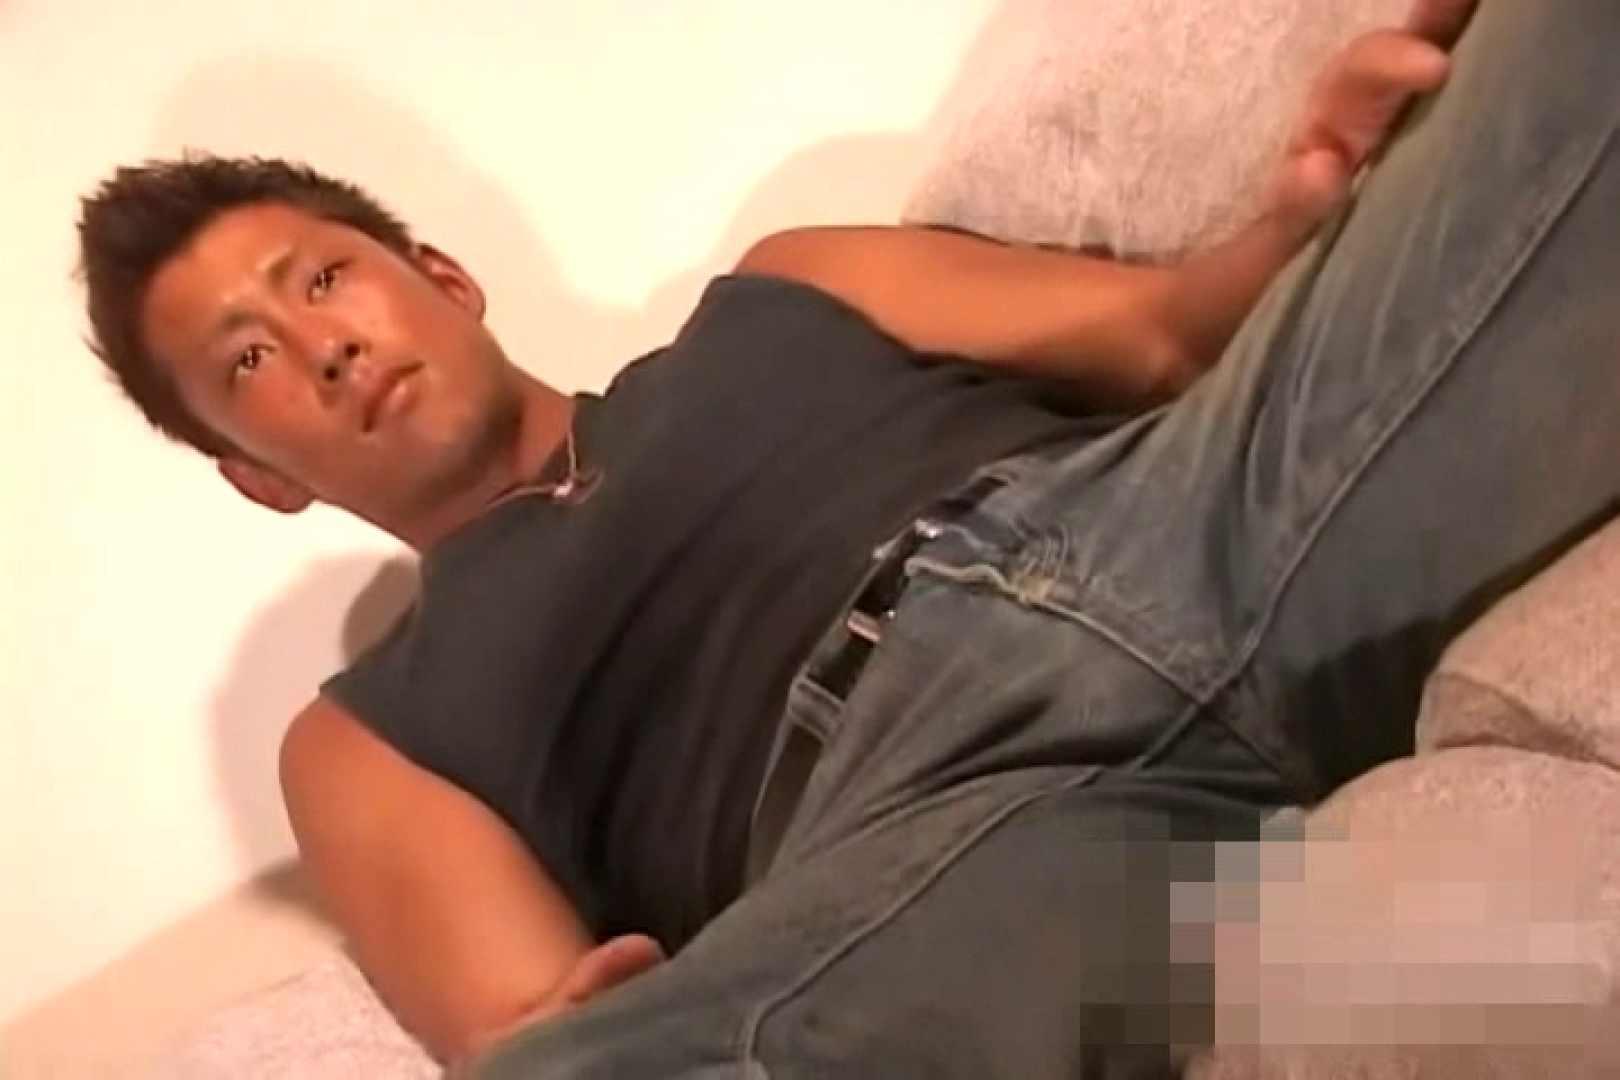 Beautiful muscle モッコリ野郎達!Vol.02 イケメンのsex | スリム美少年系ジャニ系  80pic 4